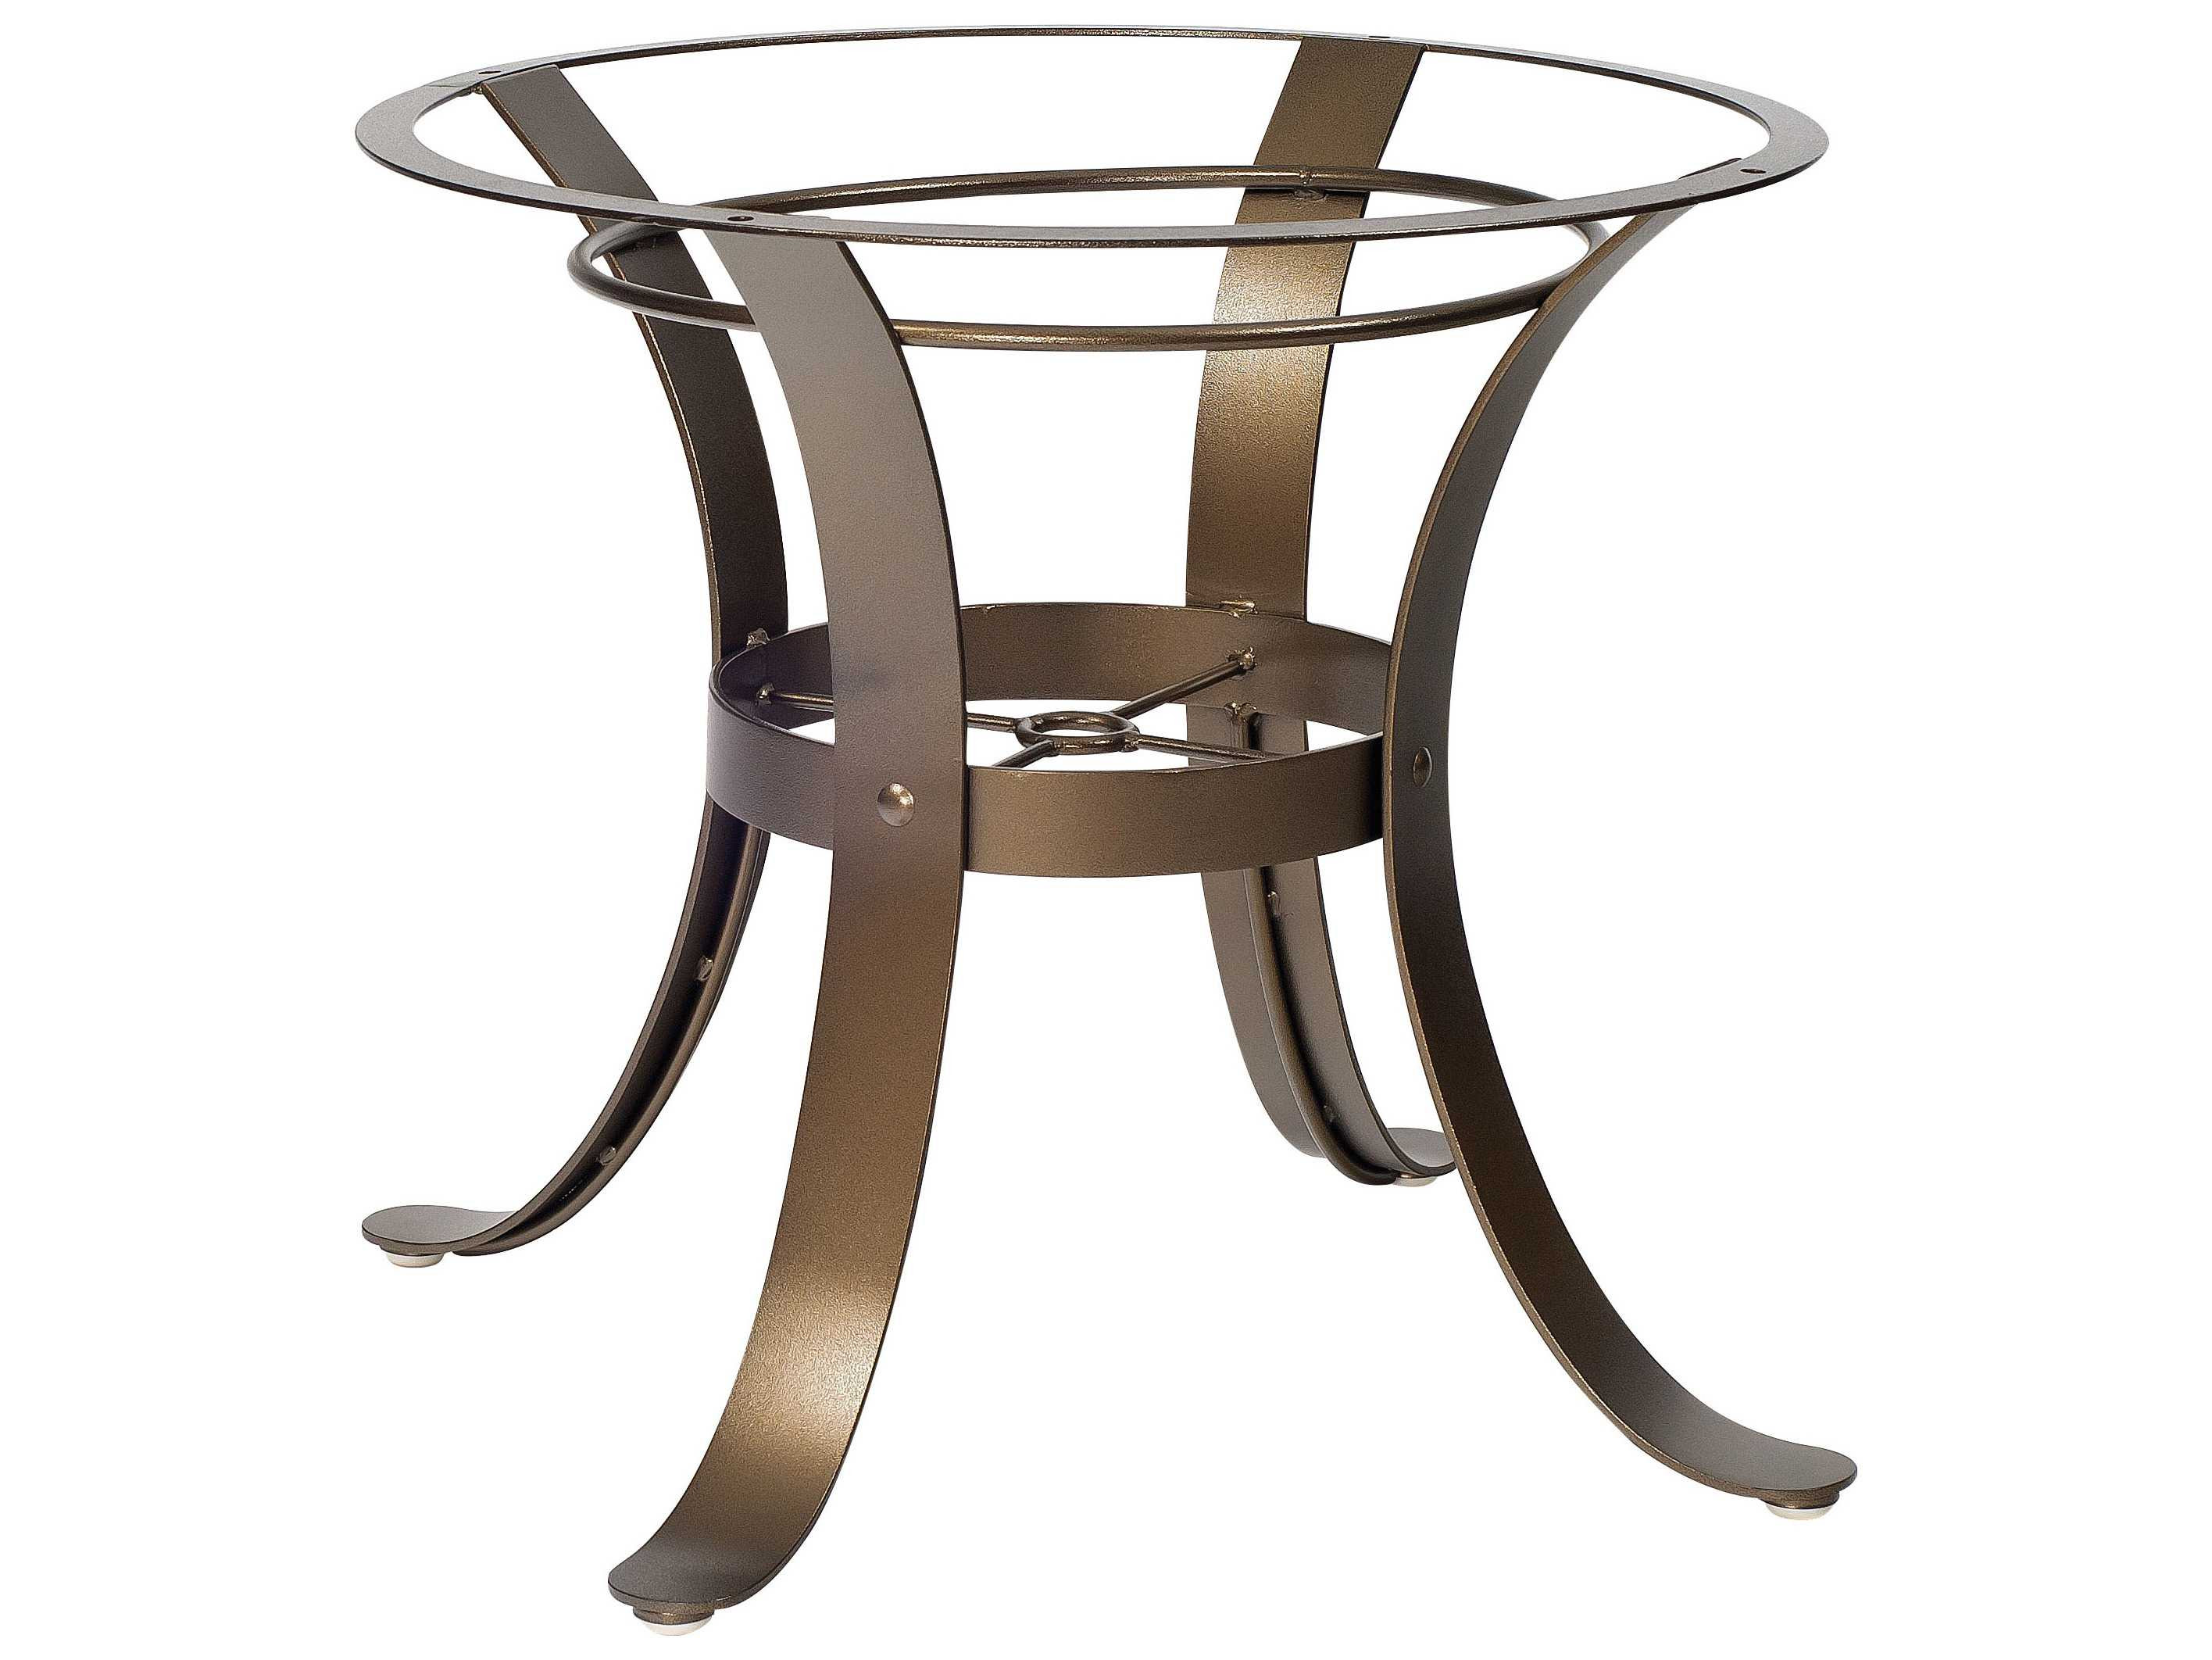 Woodard Cascade Wrought Iron Dining Table Base   2W4800